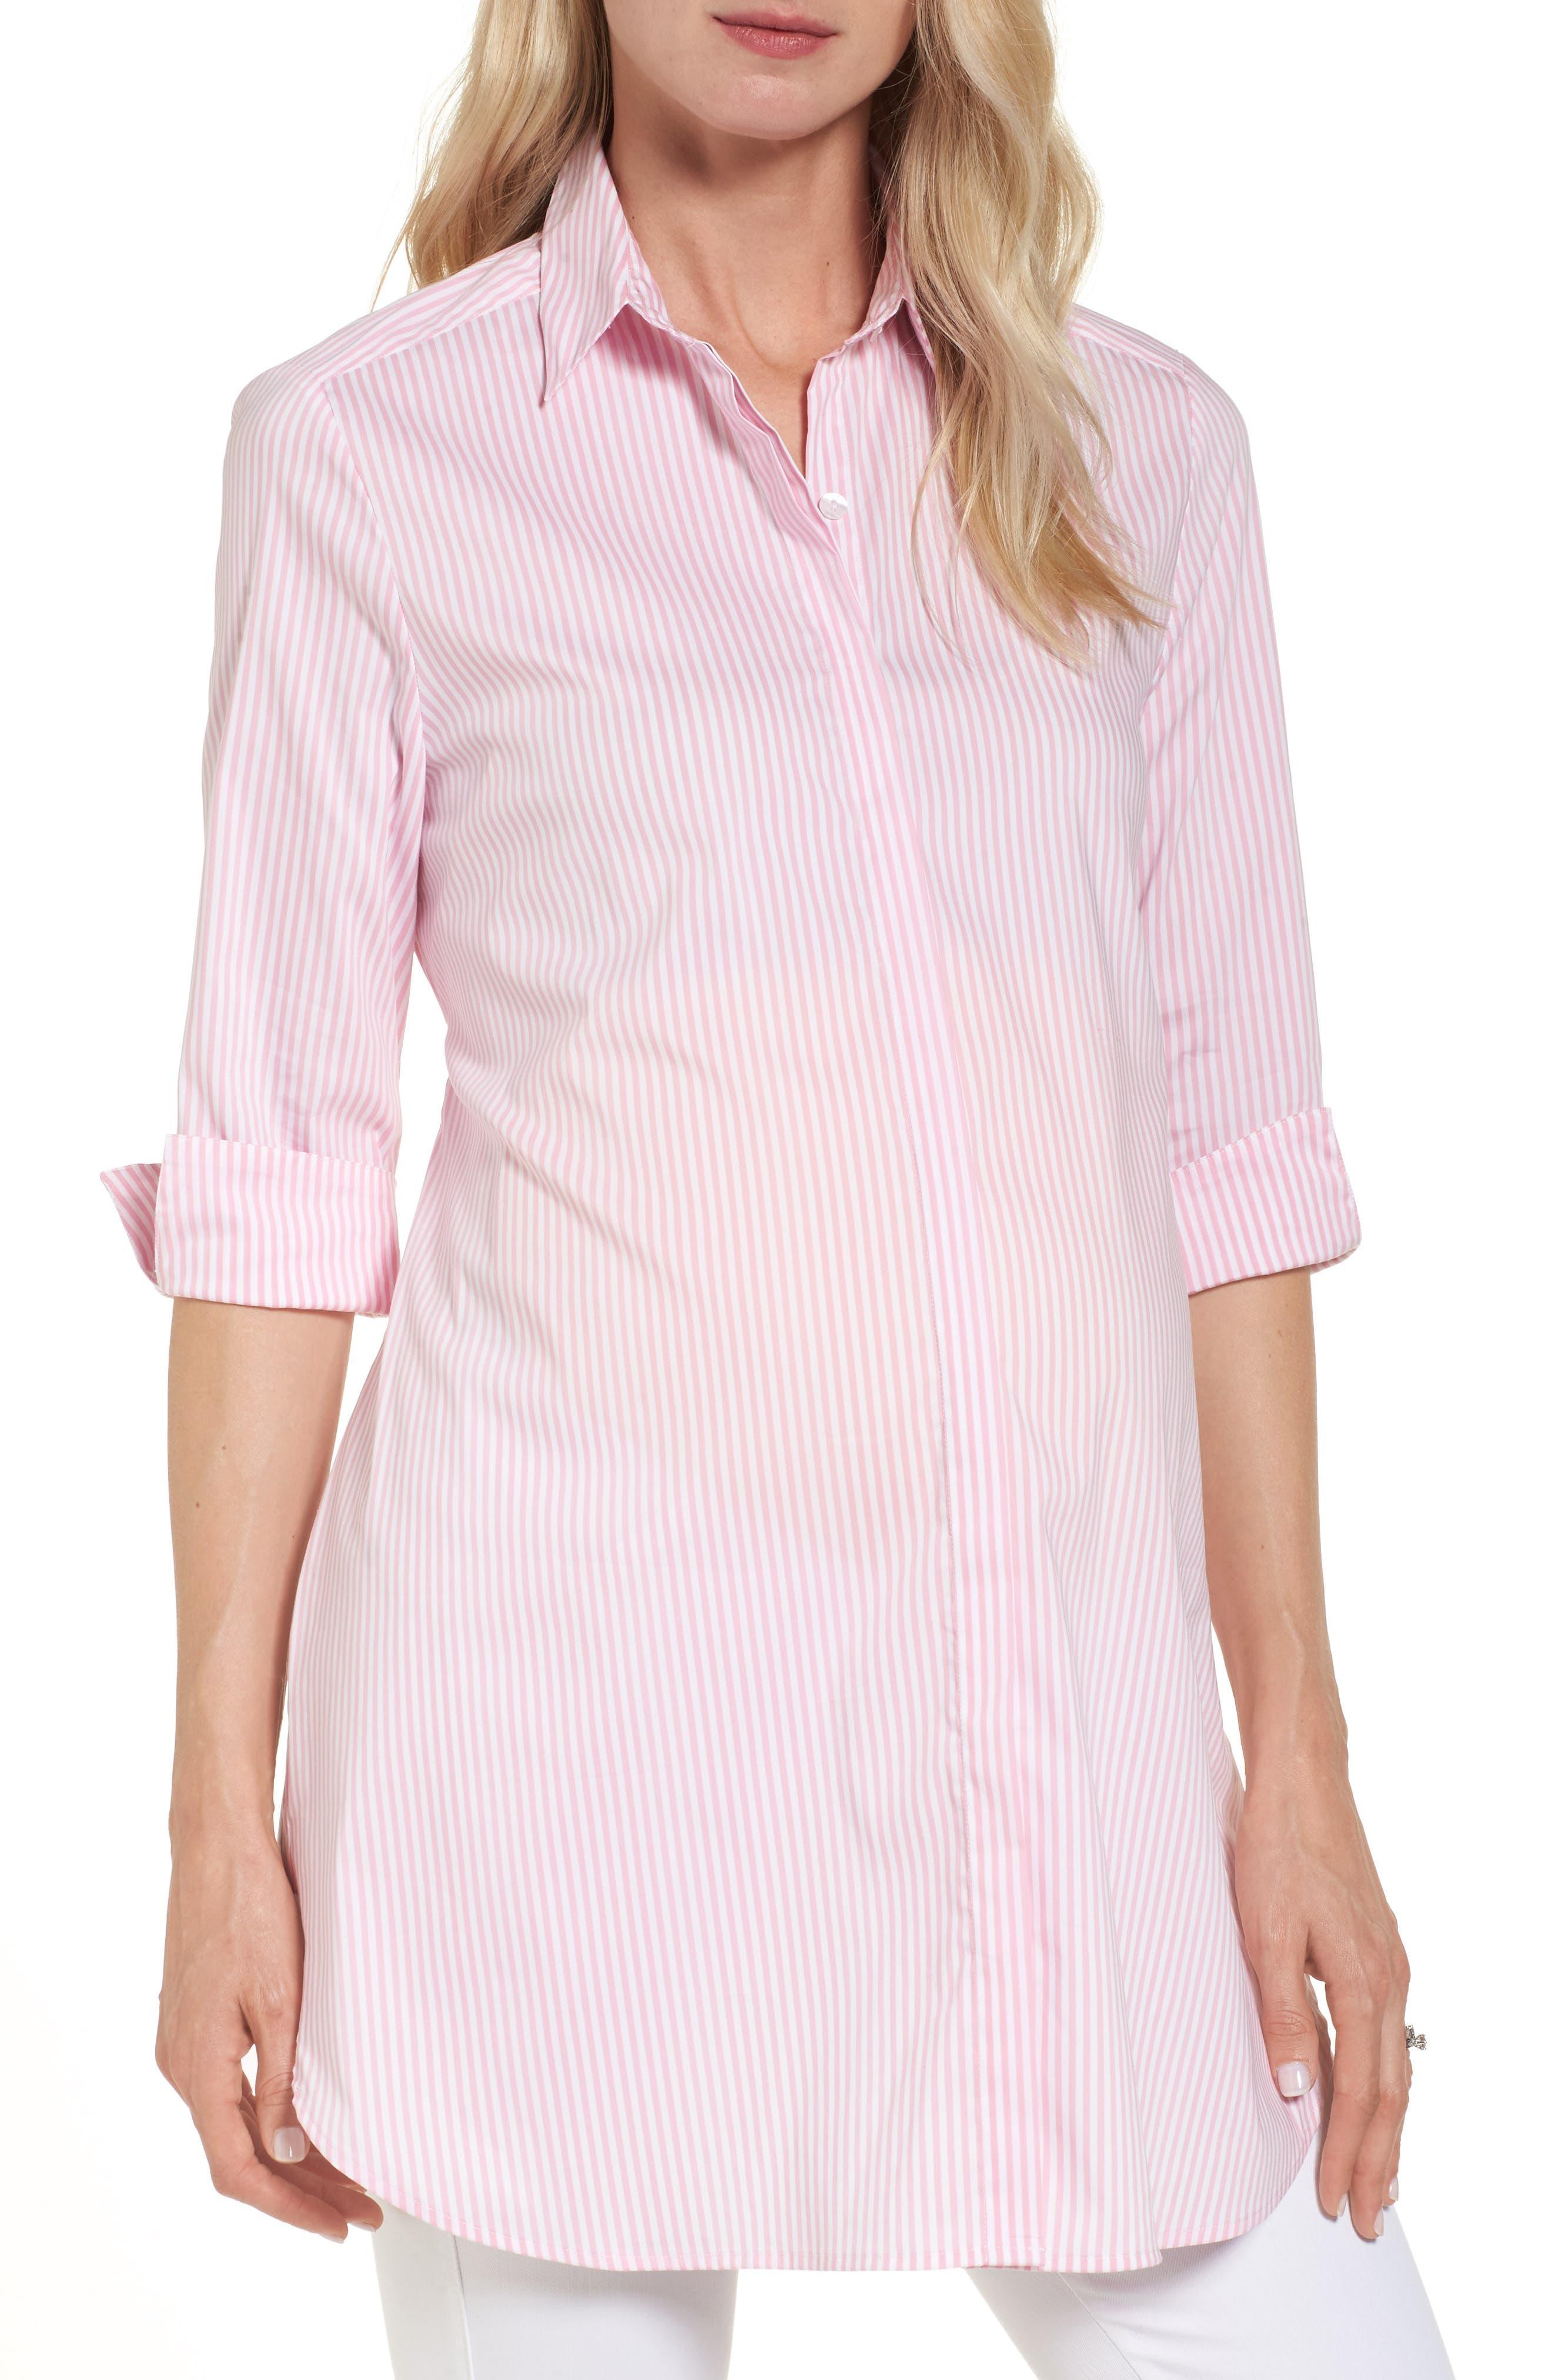 Isabella Oliver Dora Stripe Maternity Shirt